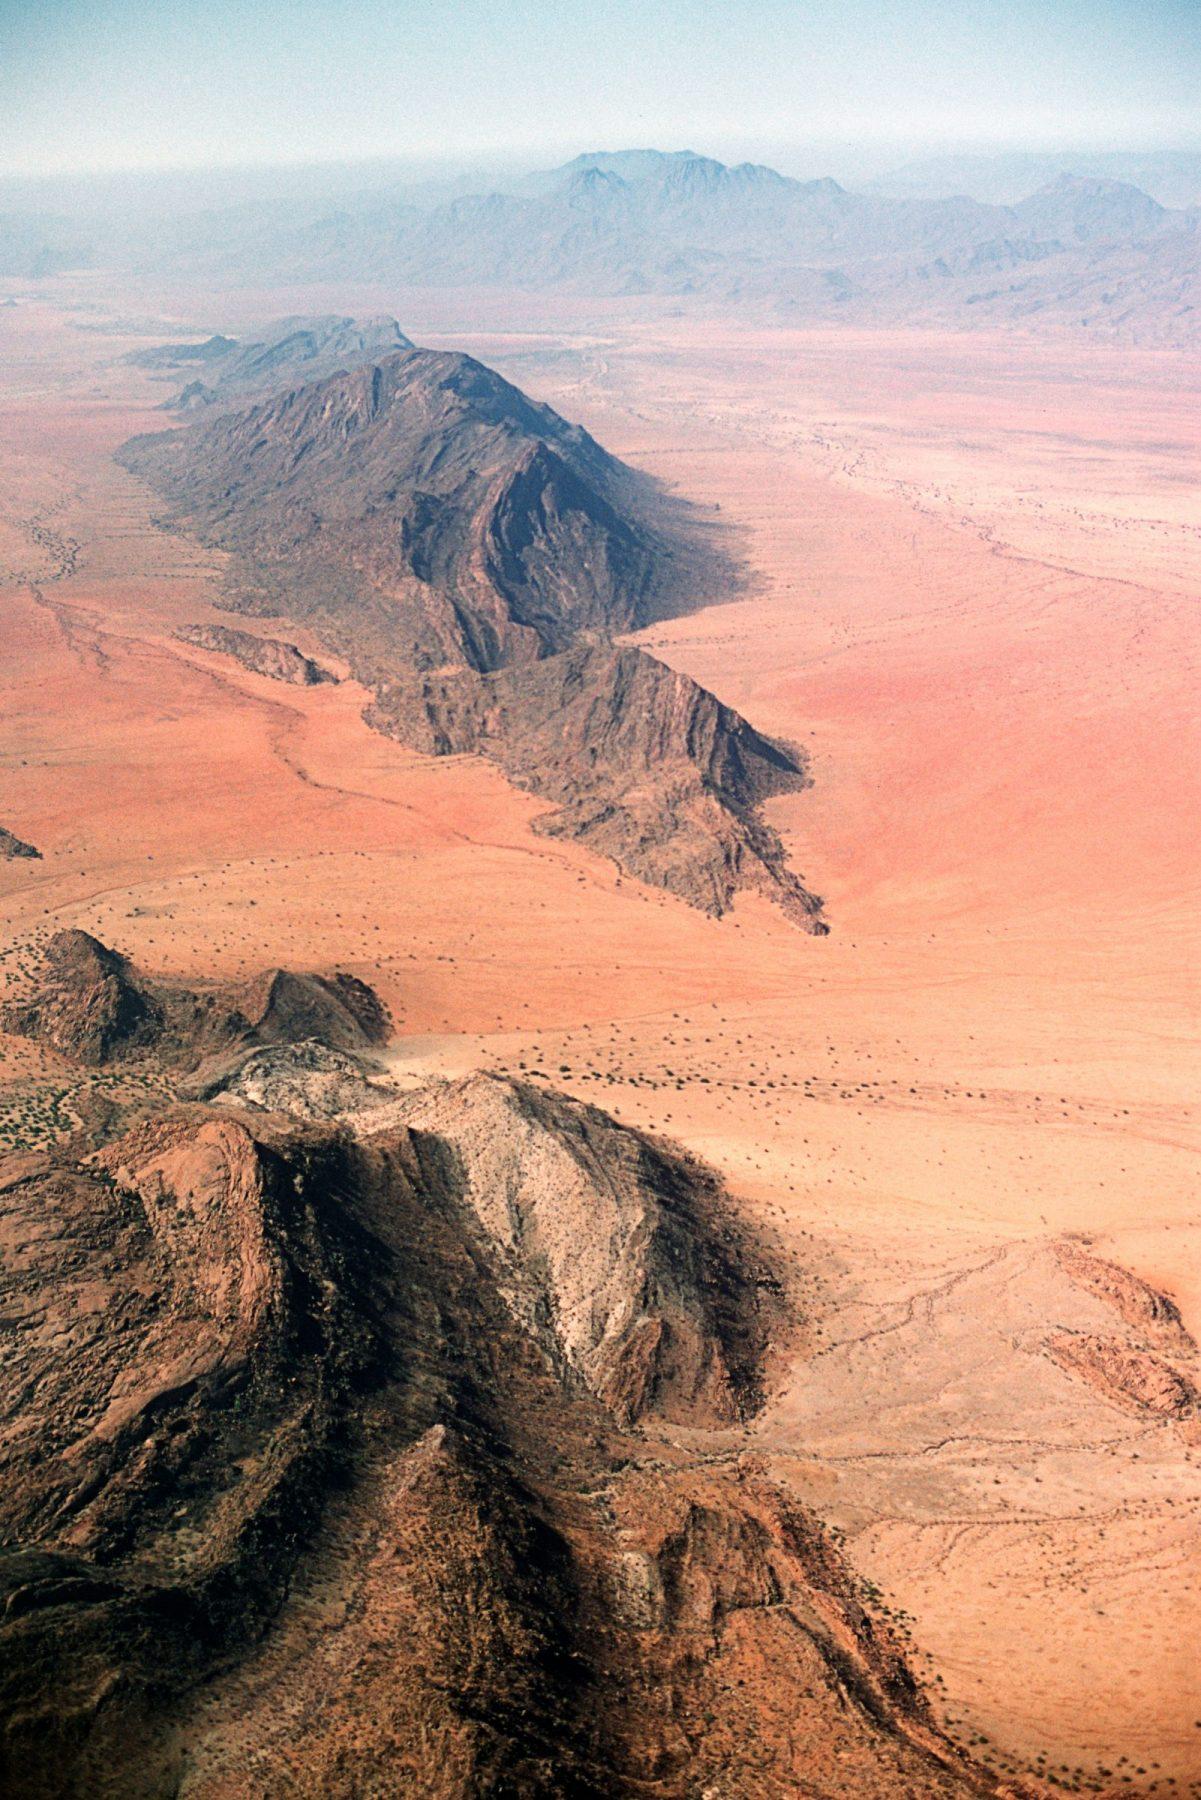 NAMIBIA AERIALS